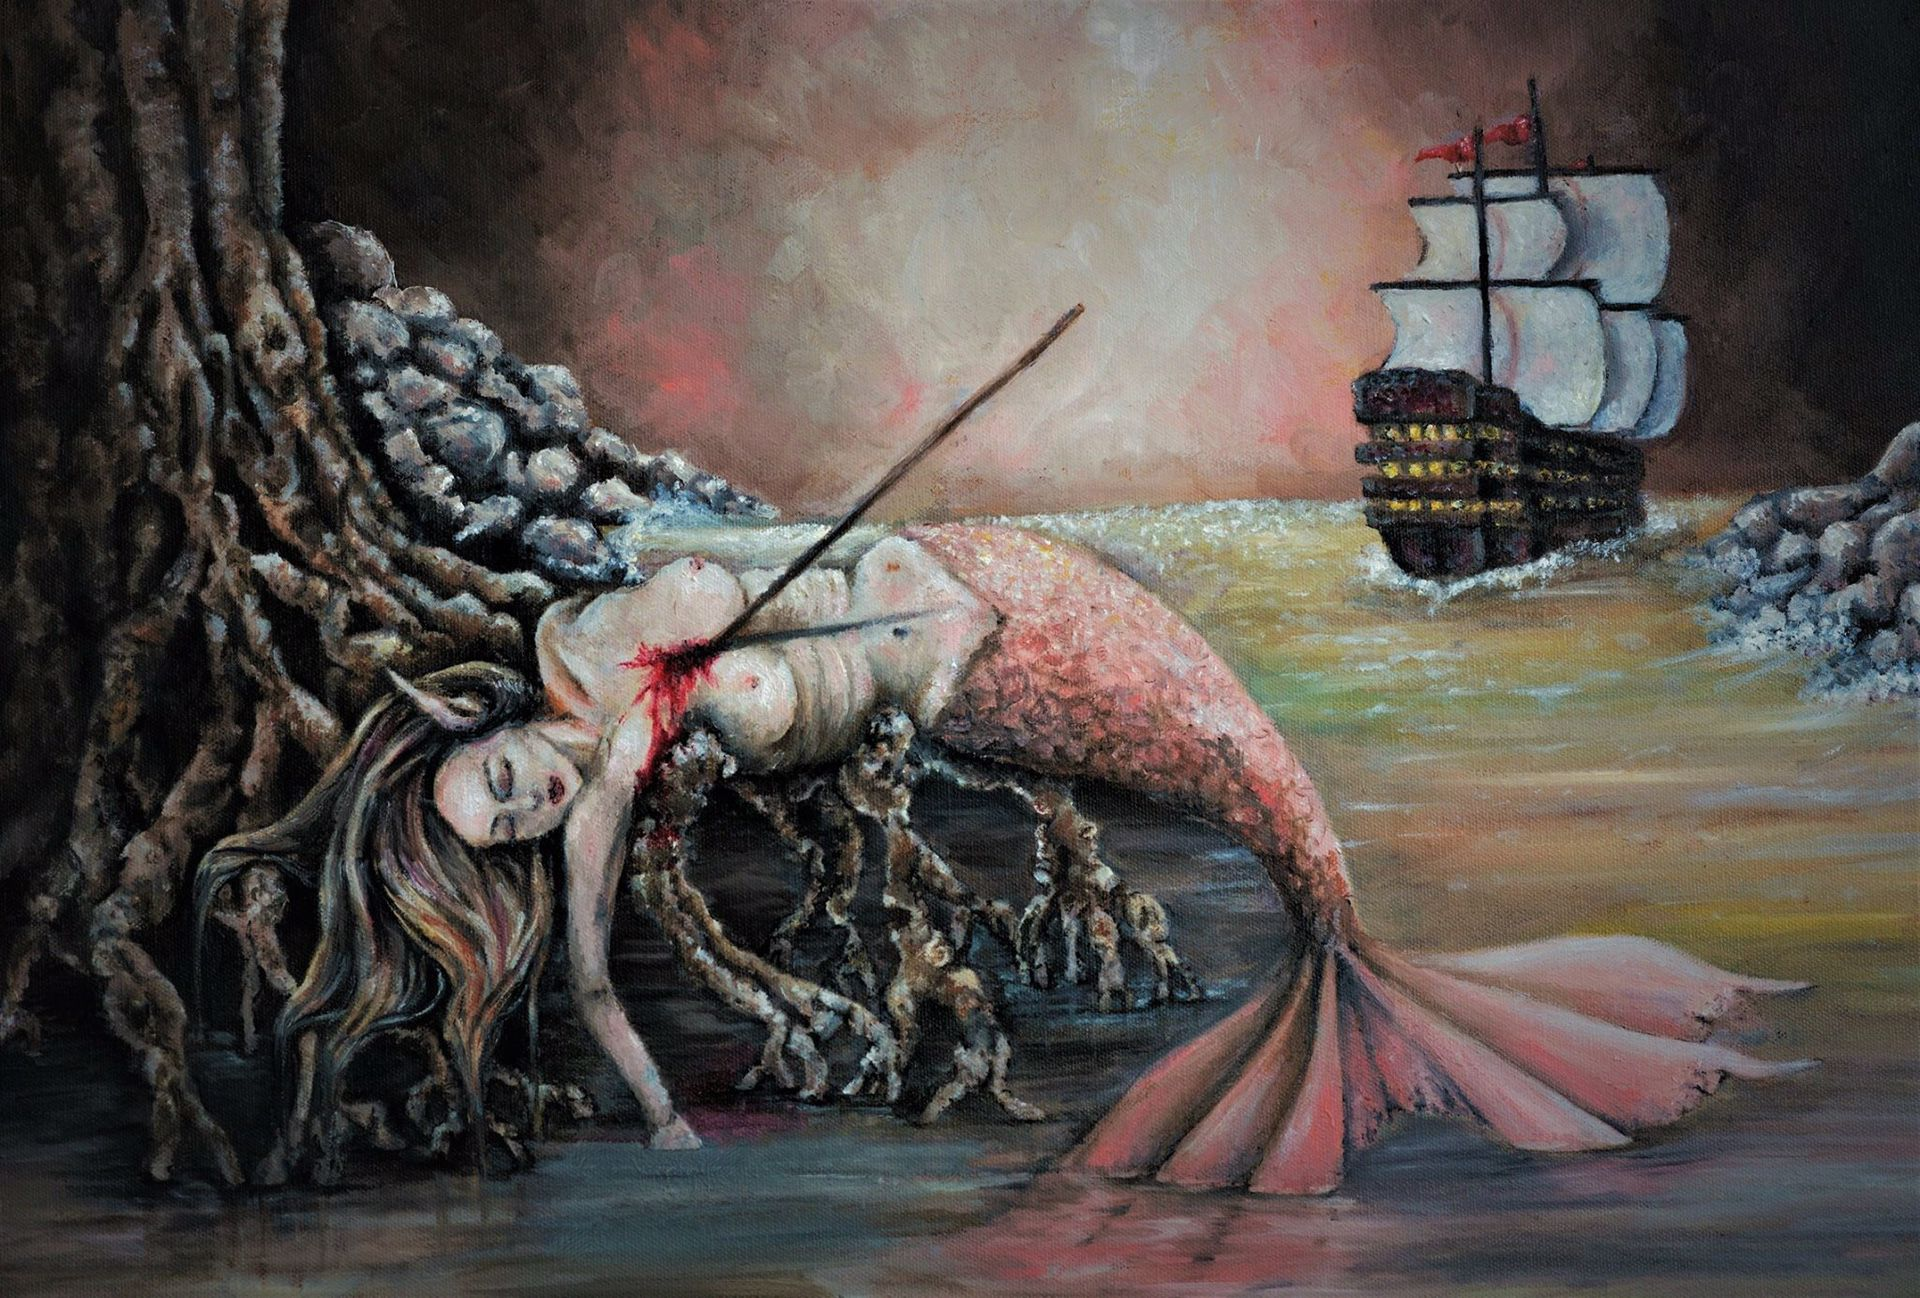 Original Mermaid Oil Painting 18 x 24 With Custom Wood Frame